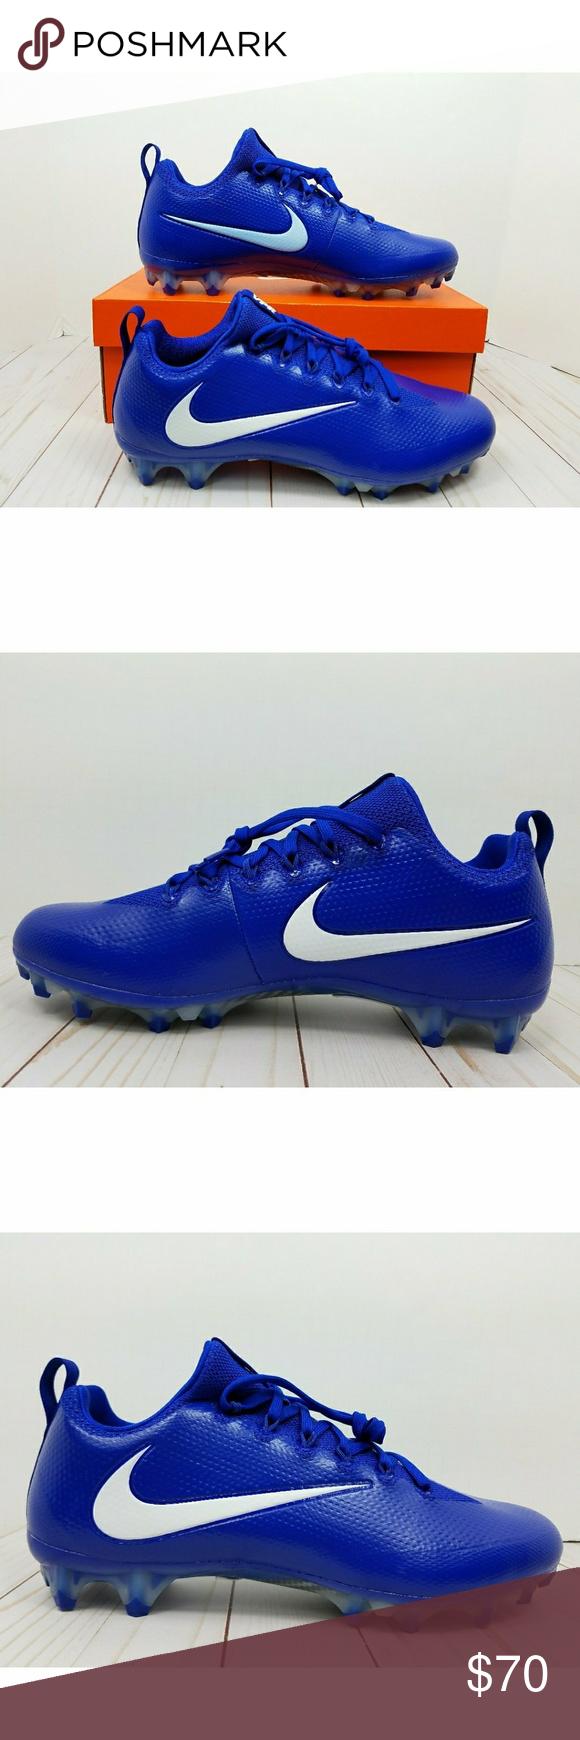 low priced 622a8 fbd26 Nike Vapor Untouchable Pro CF Football Cleats Nike Vapor Untouchable Pro CF Football  Cleats Game Royal Size 11.5 (922898-415) These cleats are brand new, ...